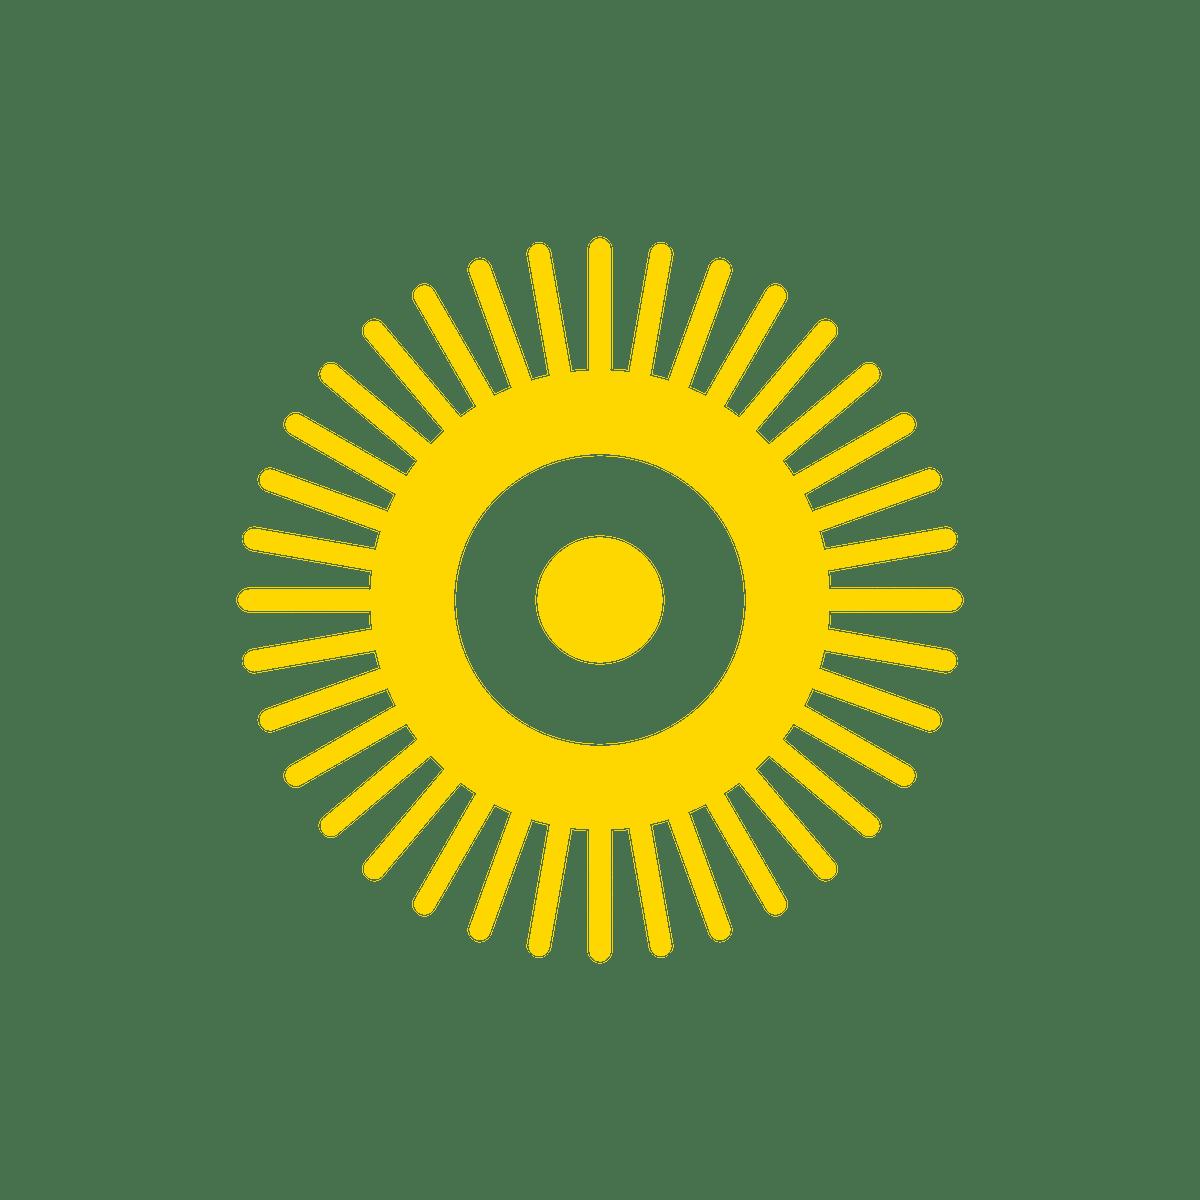 Influenze Logo